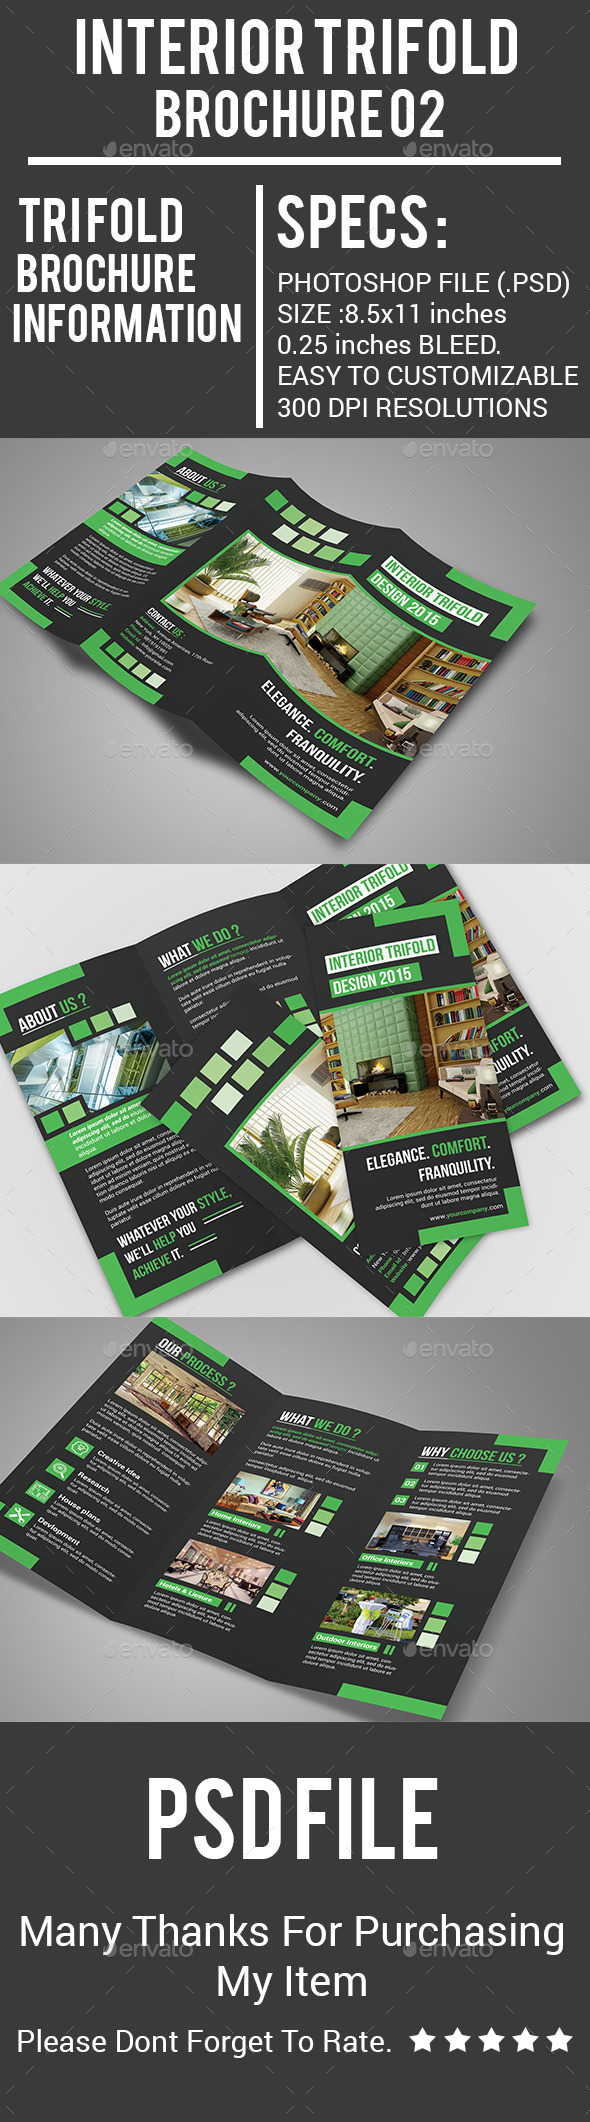 Interior Trifold Brochure 02